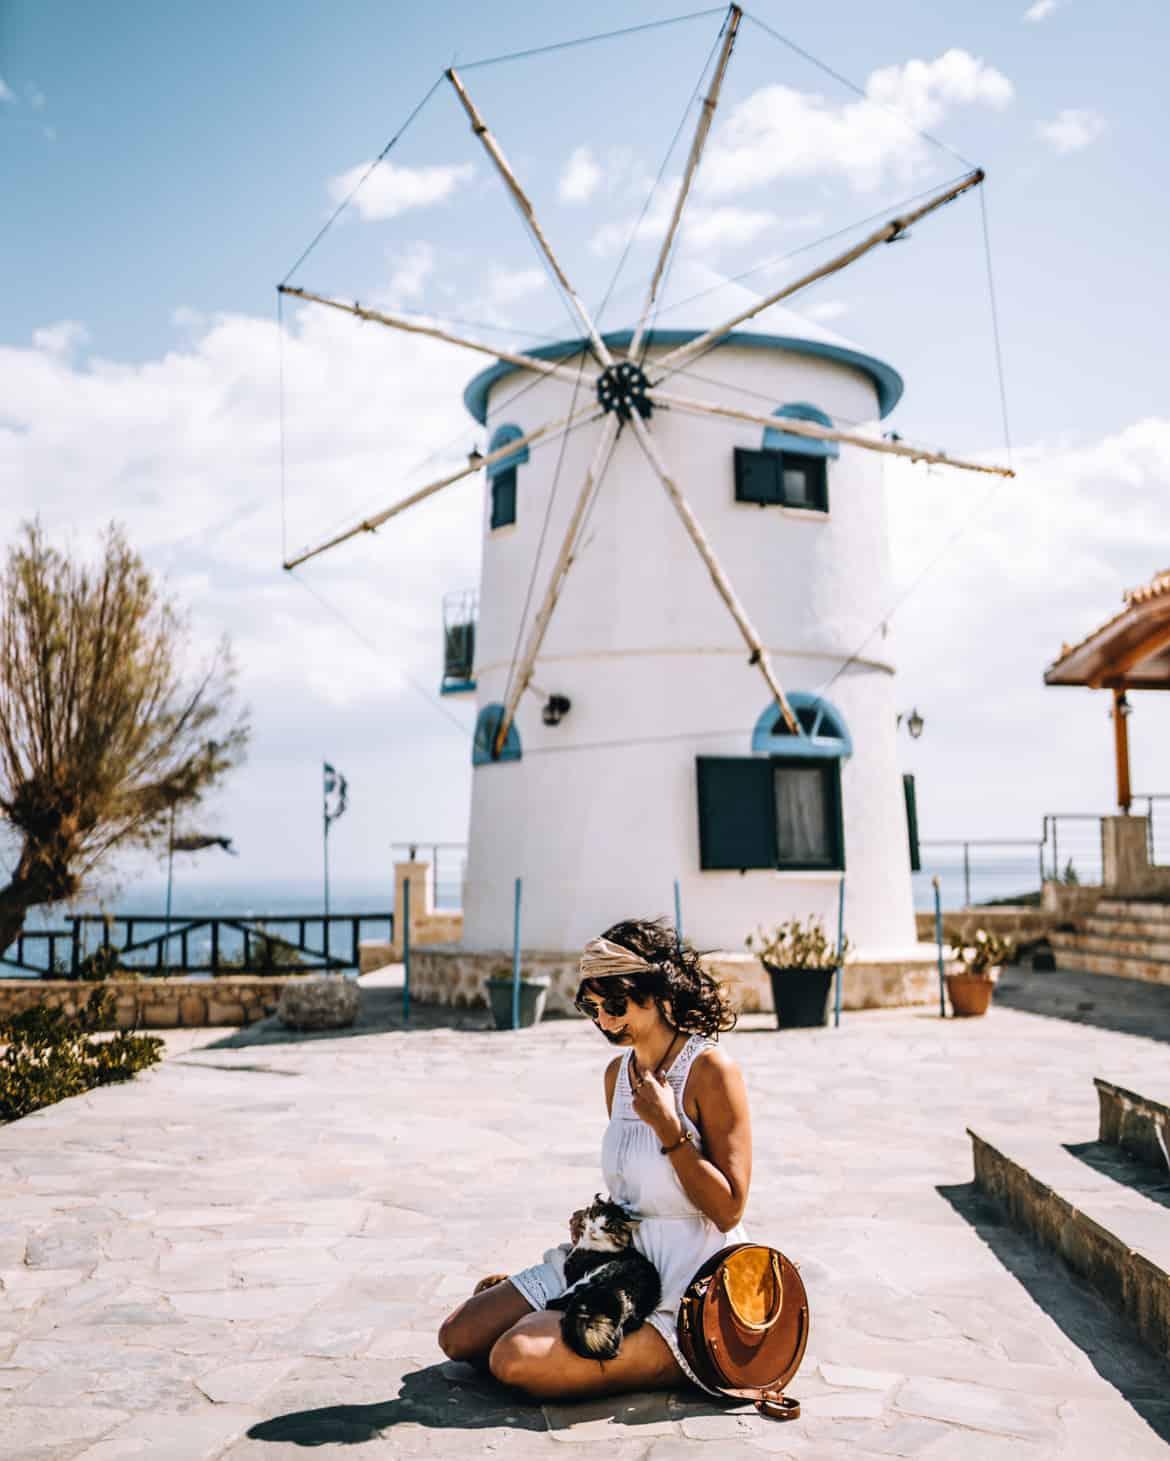 Zakynthos Urlaub - Skinari Cape, Windmühle